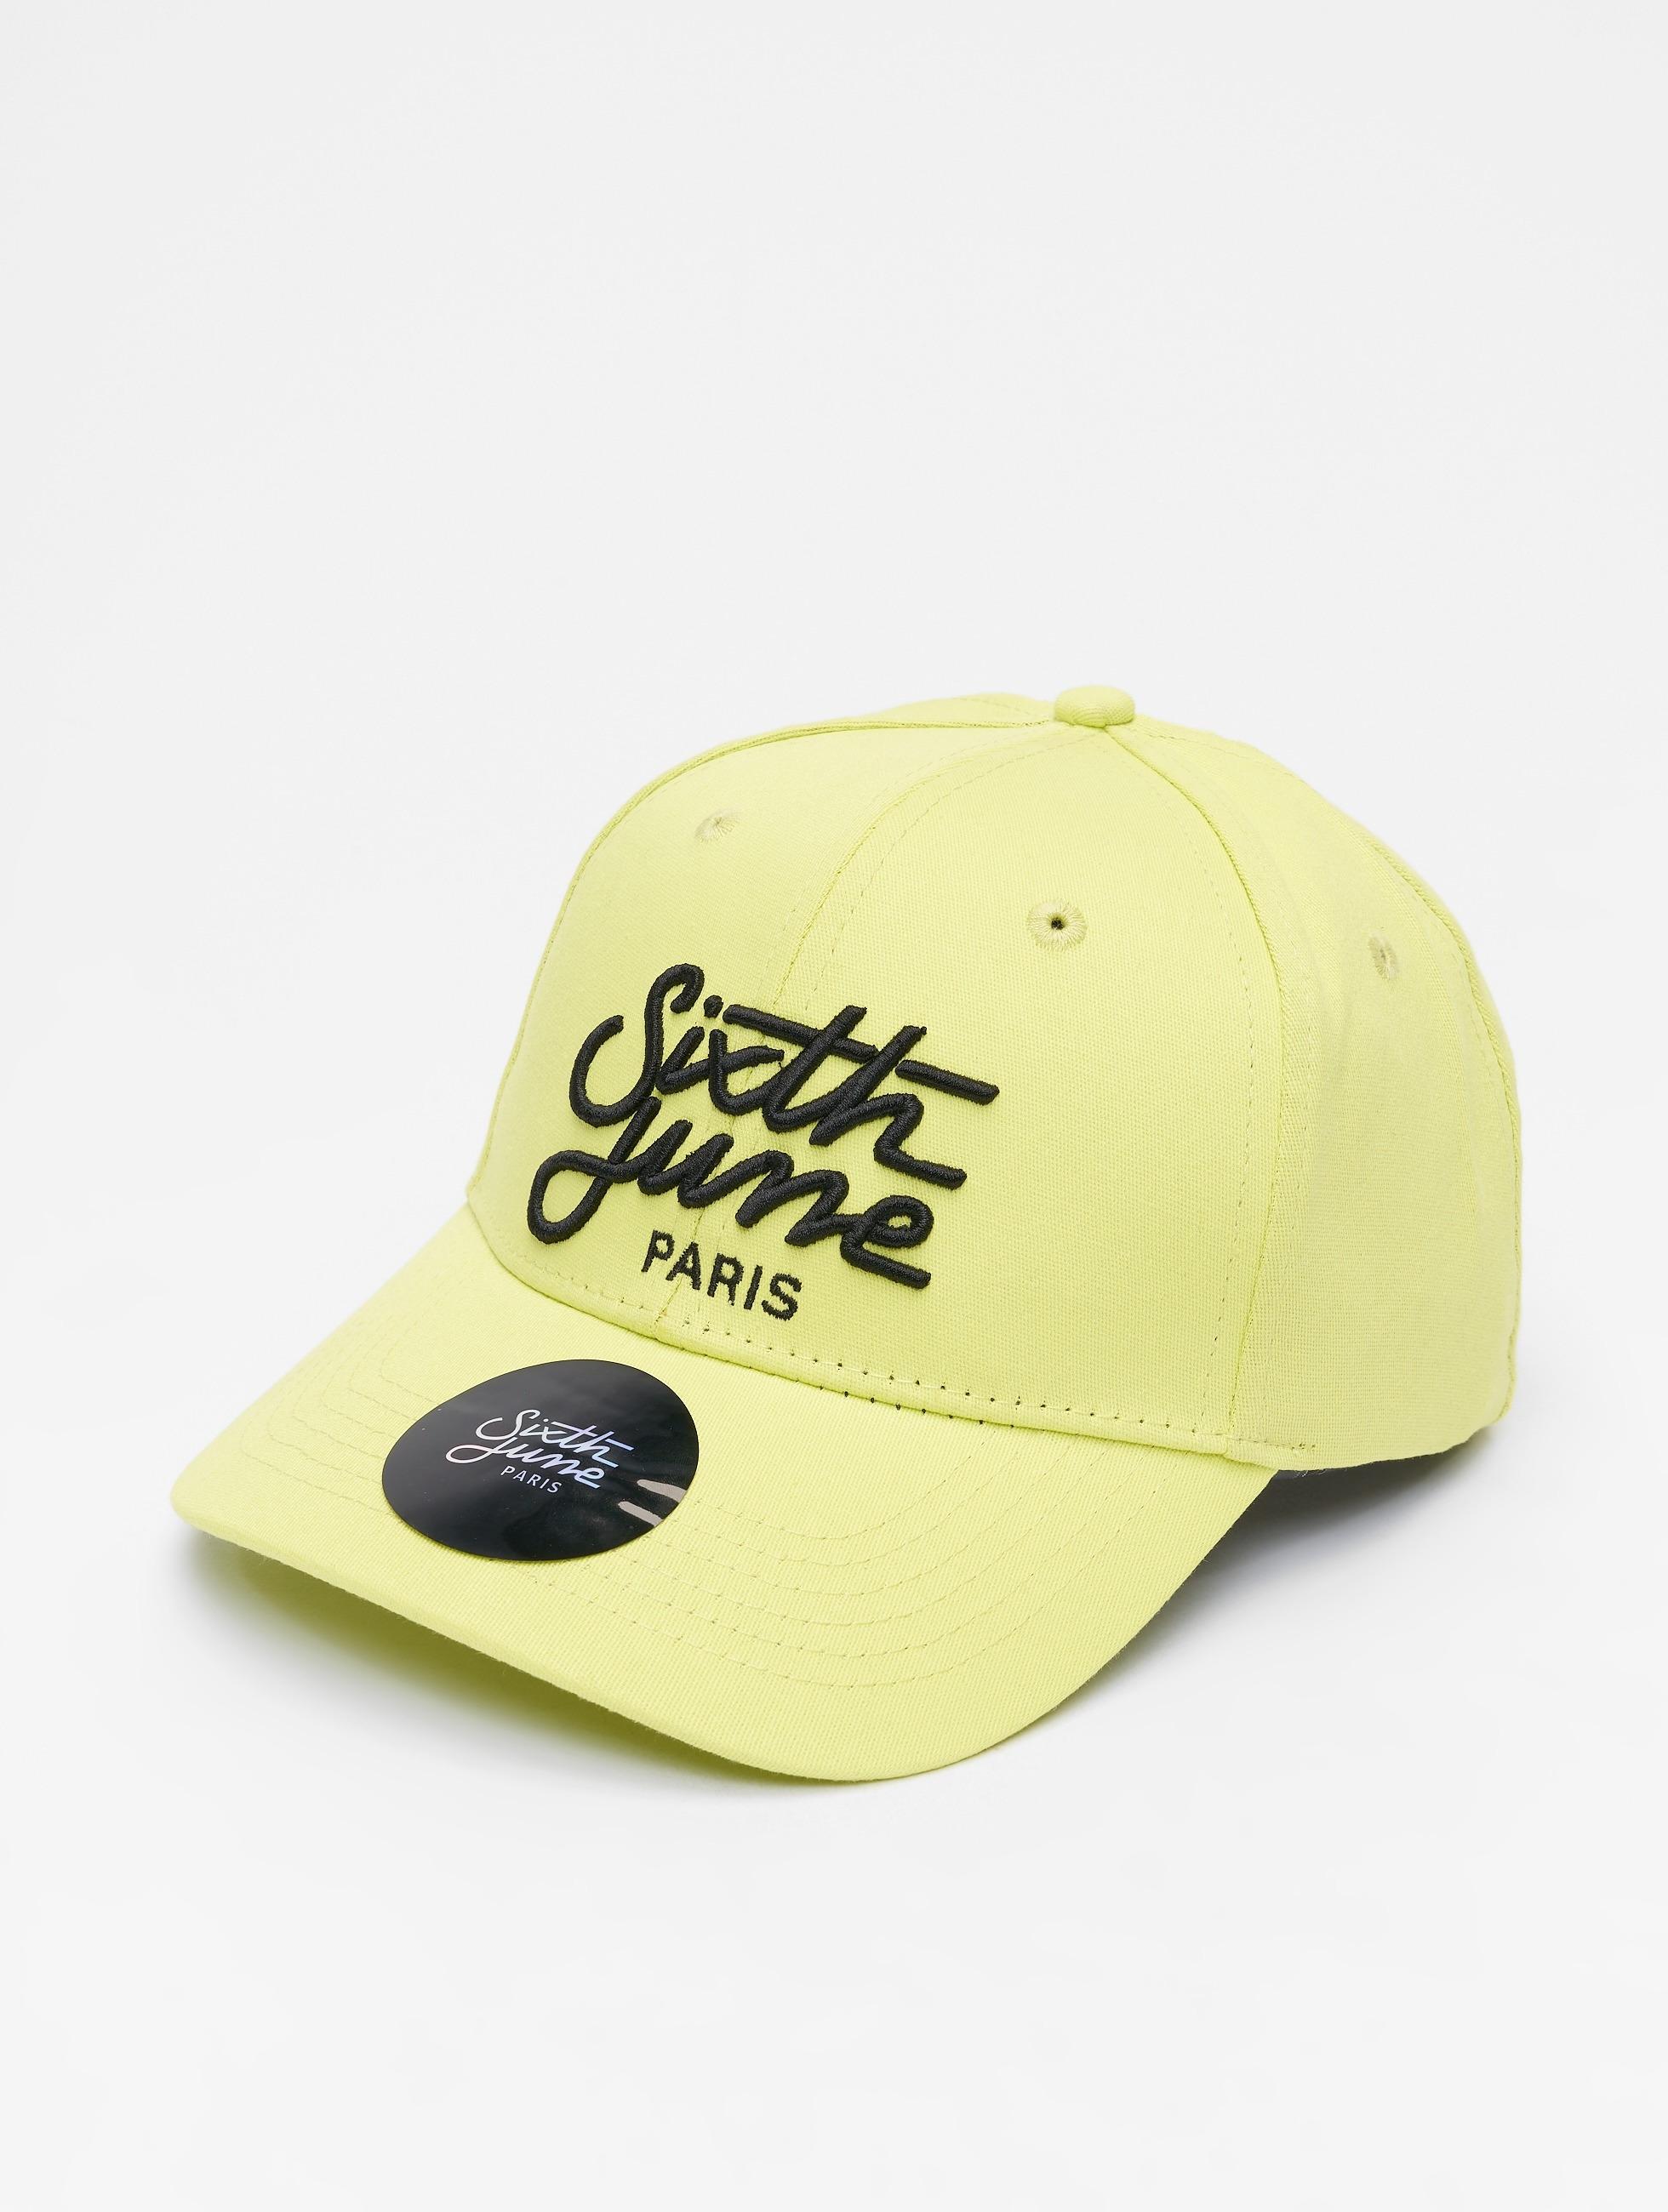 Sixth June | Curved Logo jaune Homme,Femme Casquette Snapback & Strapback